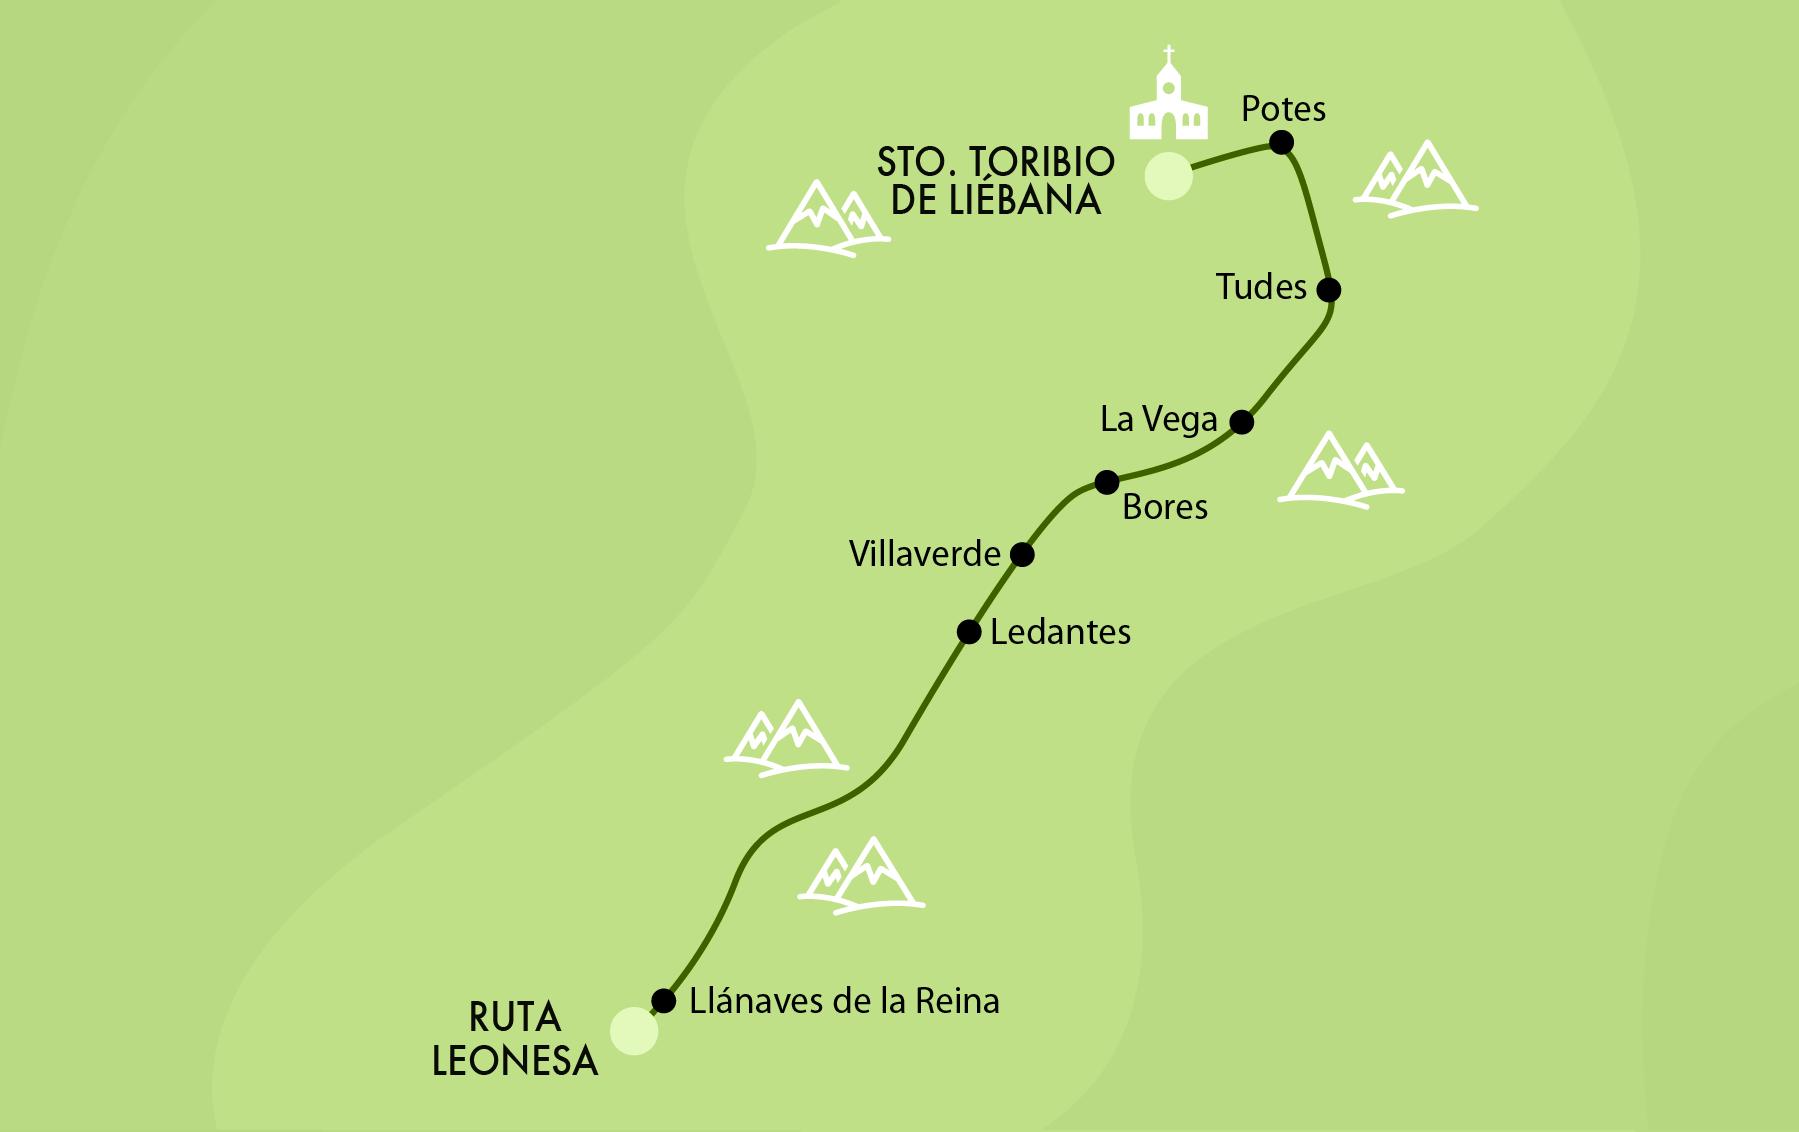 ruta leonesa